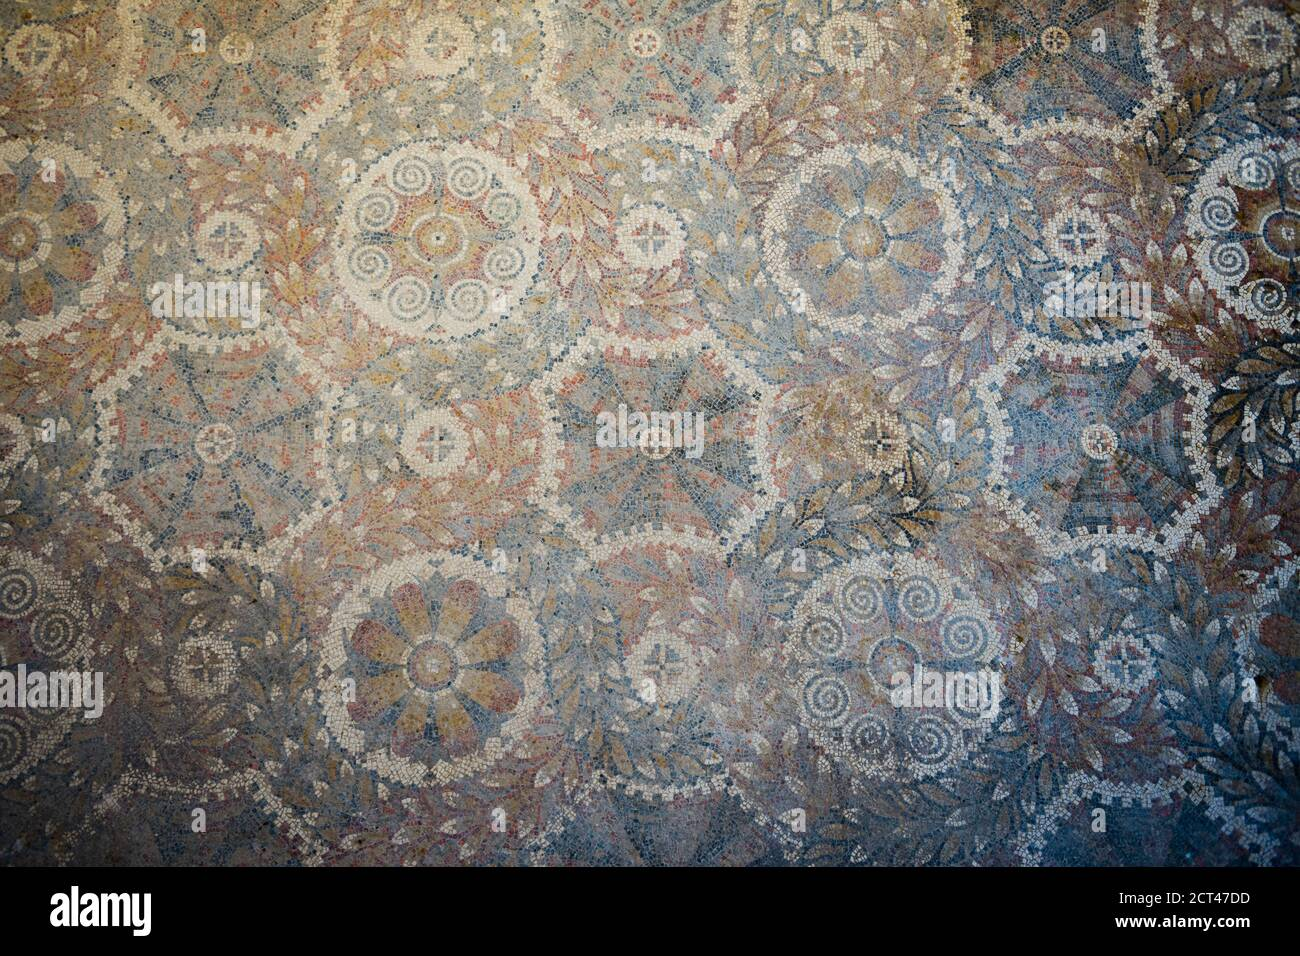 Villa Romana del Tellaro, mosaic patterns at the old house near Noto in South East Sicily, Italy, Europe Stock Photo